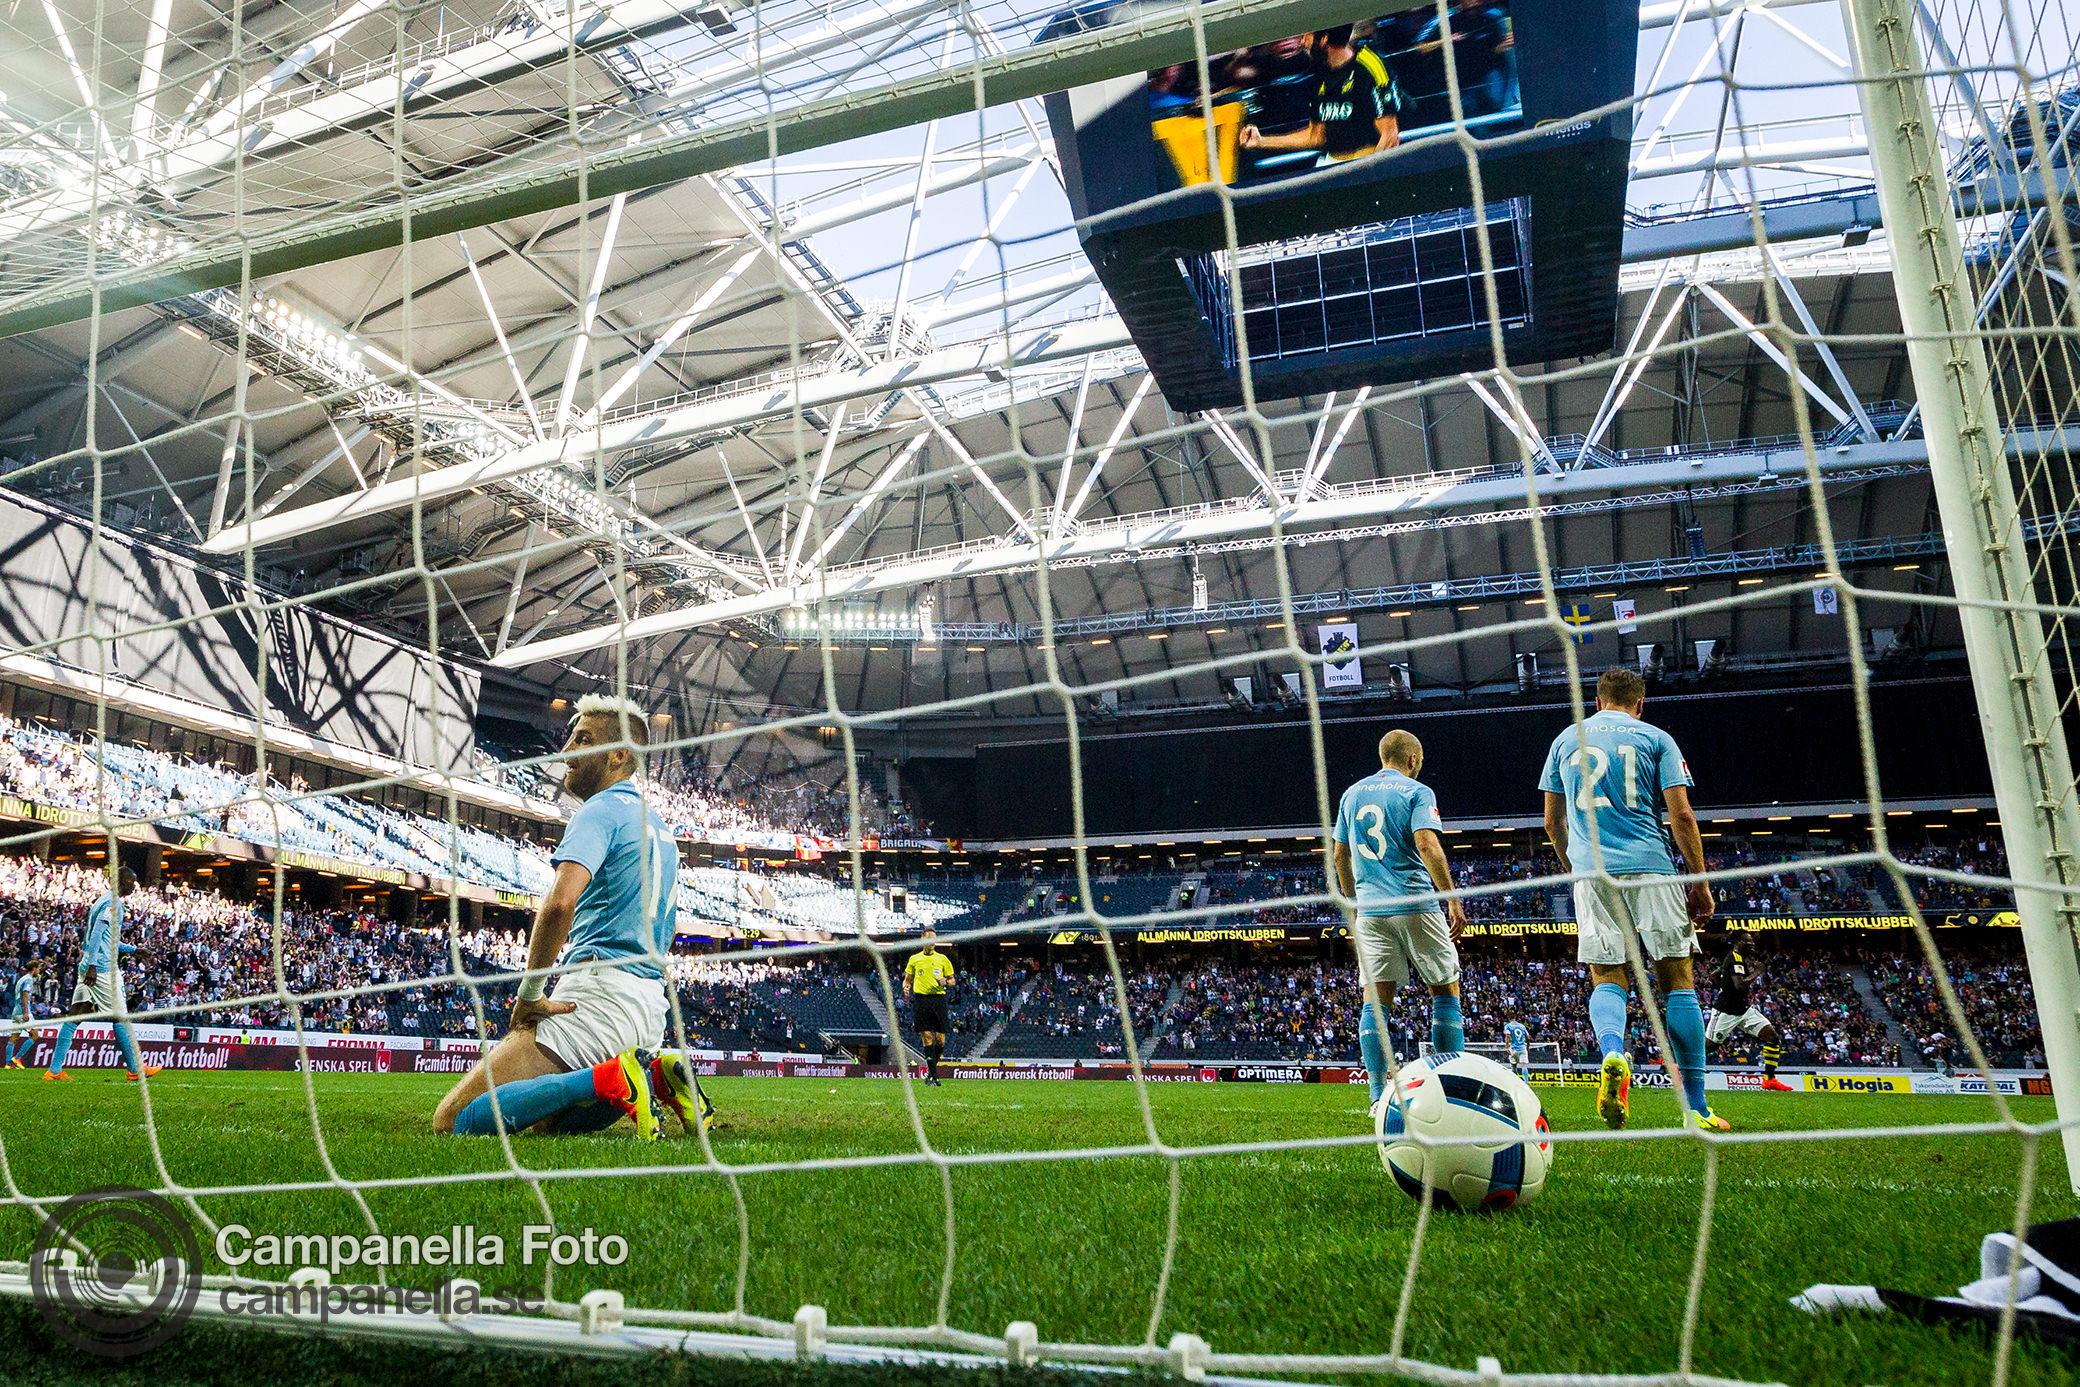 AIK holds Malmö to a draw - Michael Campanella Photography